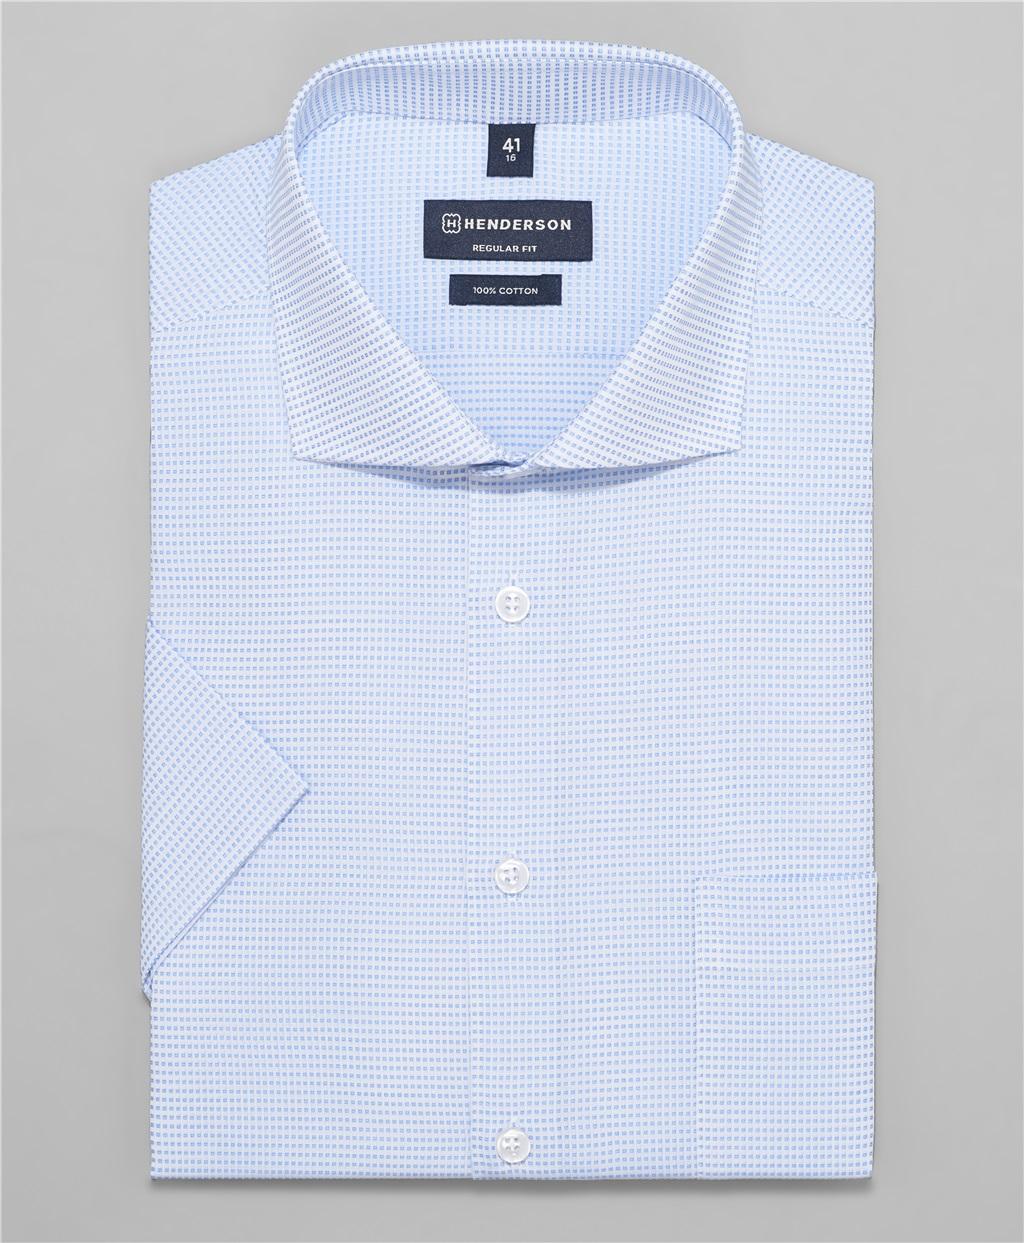 Рубашка прямой силуэт HENDERSON SHS-0452 BLUE фото